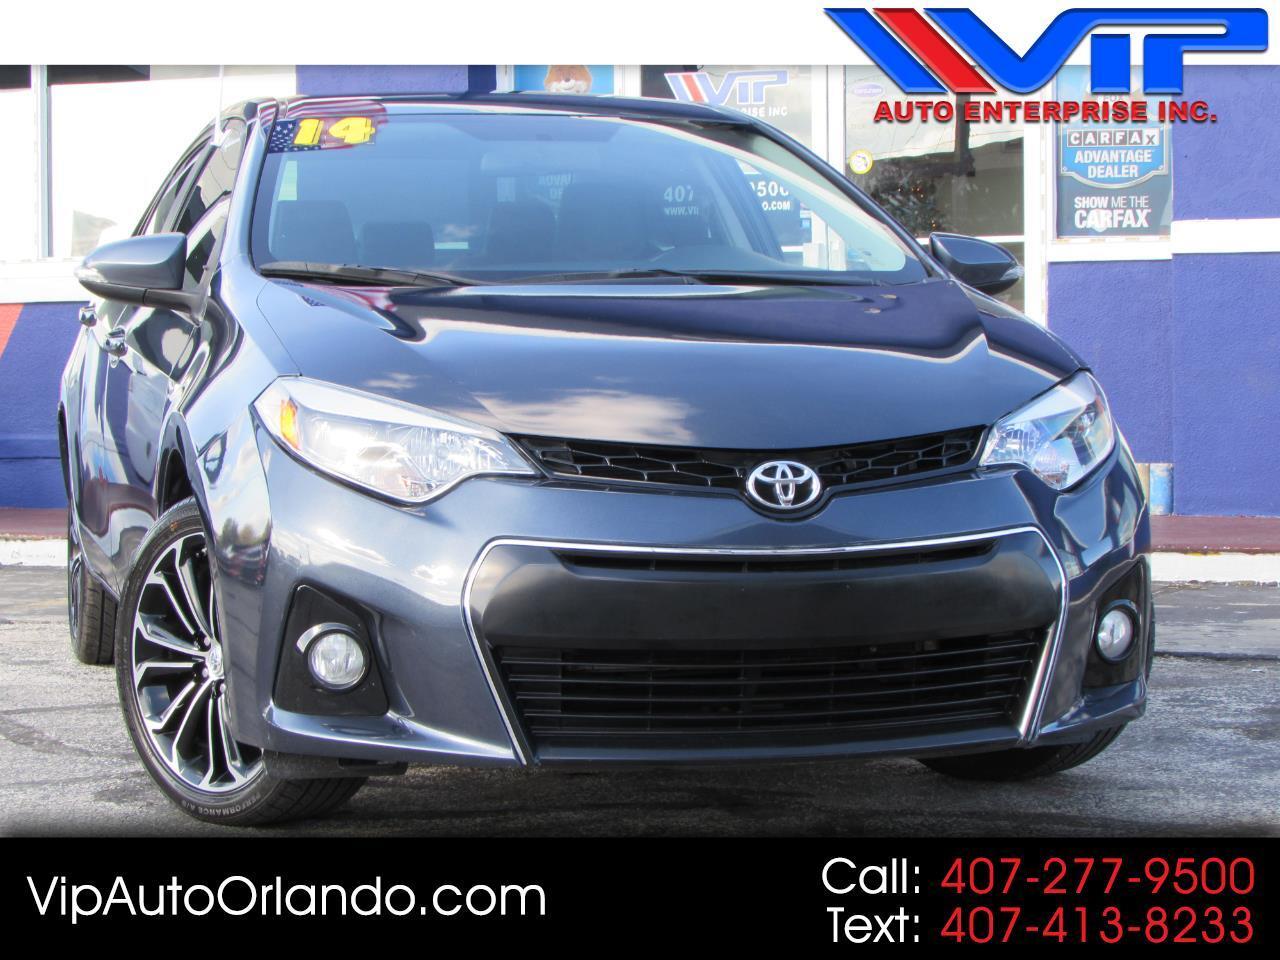 2014 Toyota Corolla 4dr Sdn Auto S Special Edition (Natl)